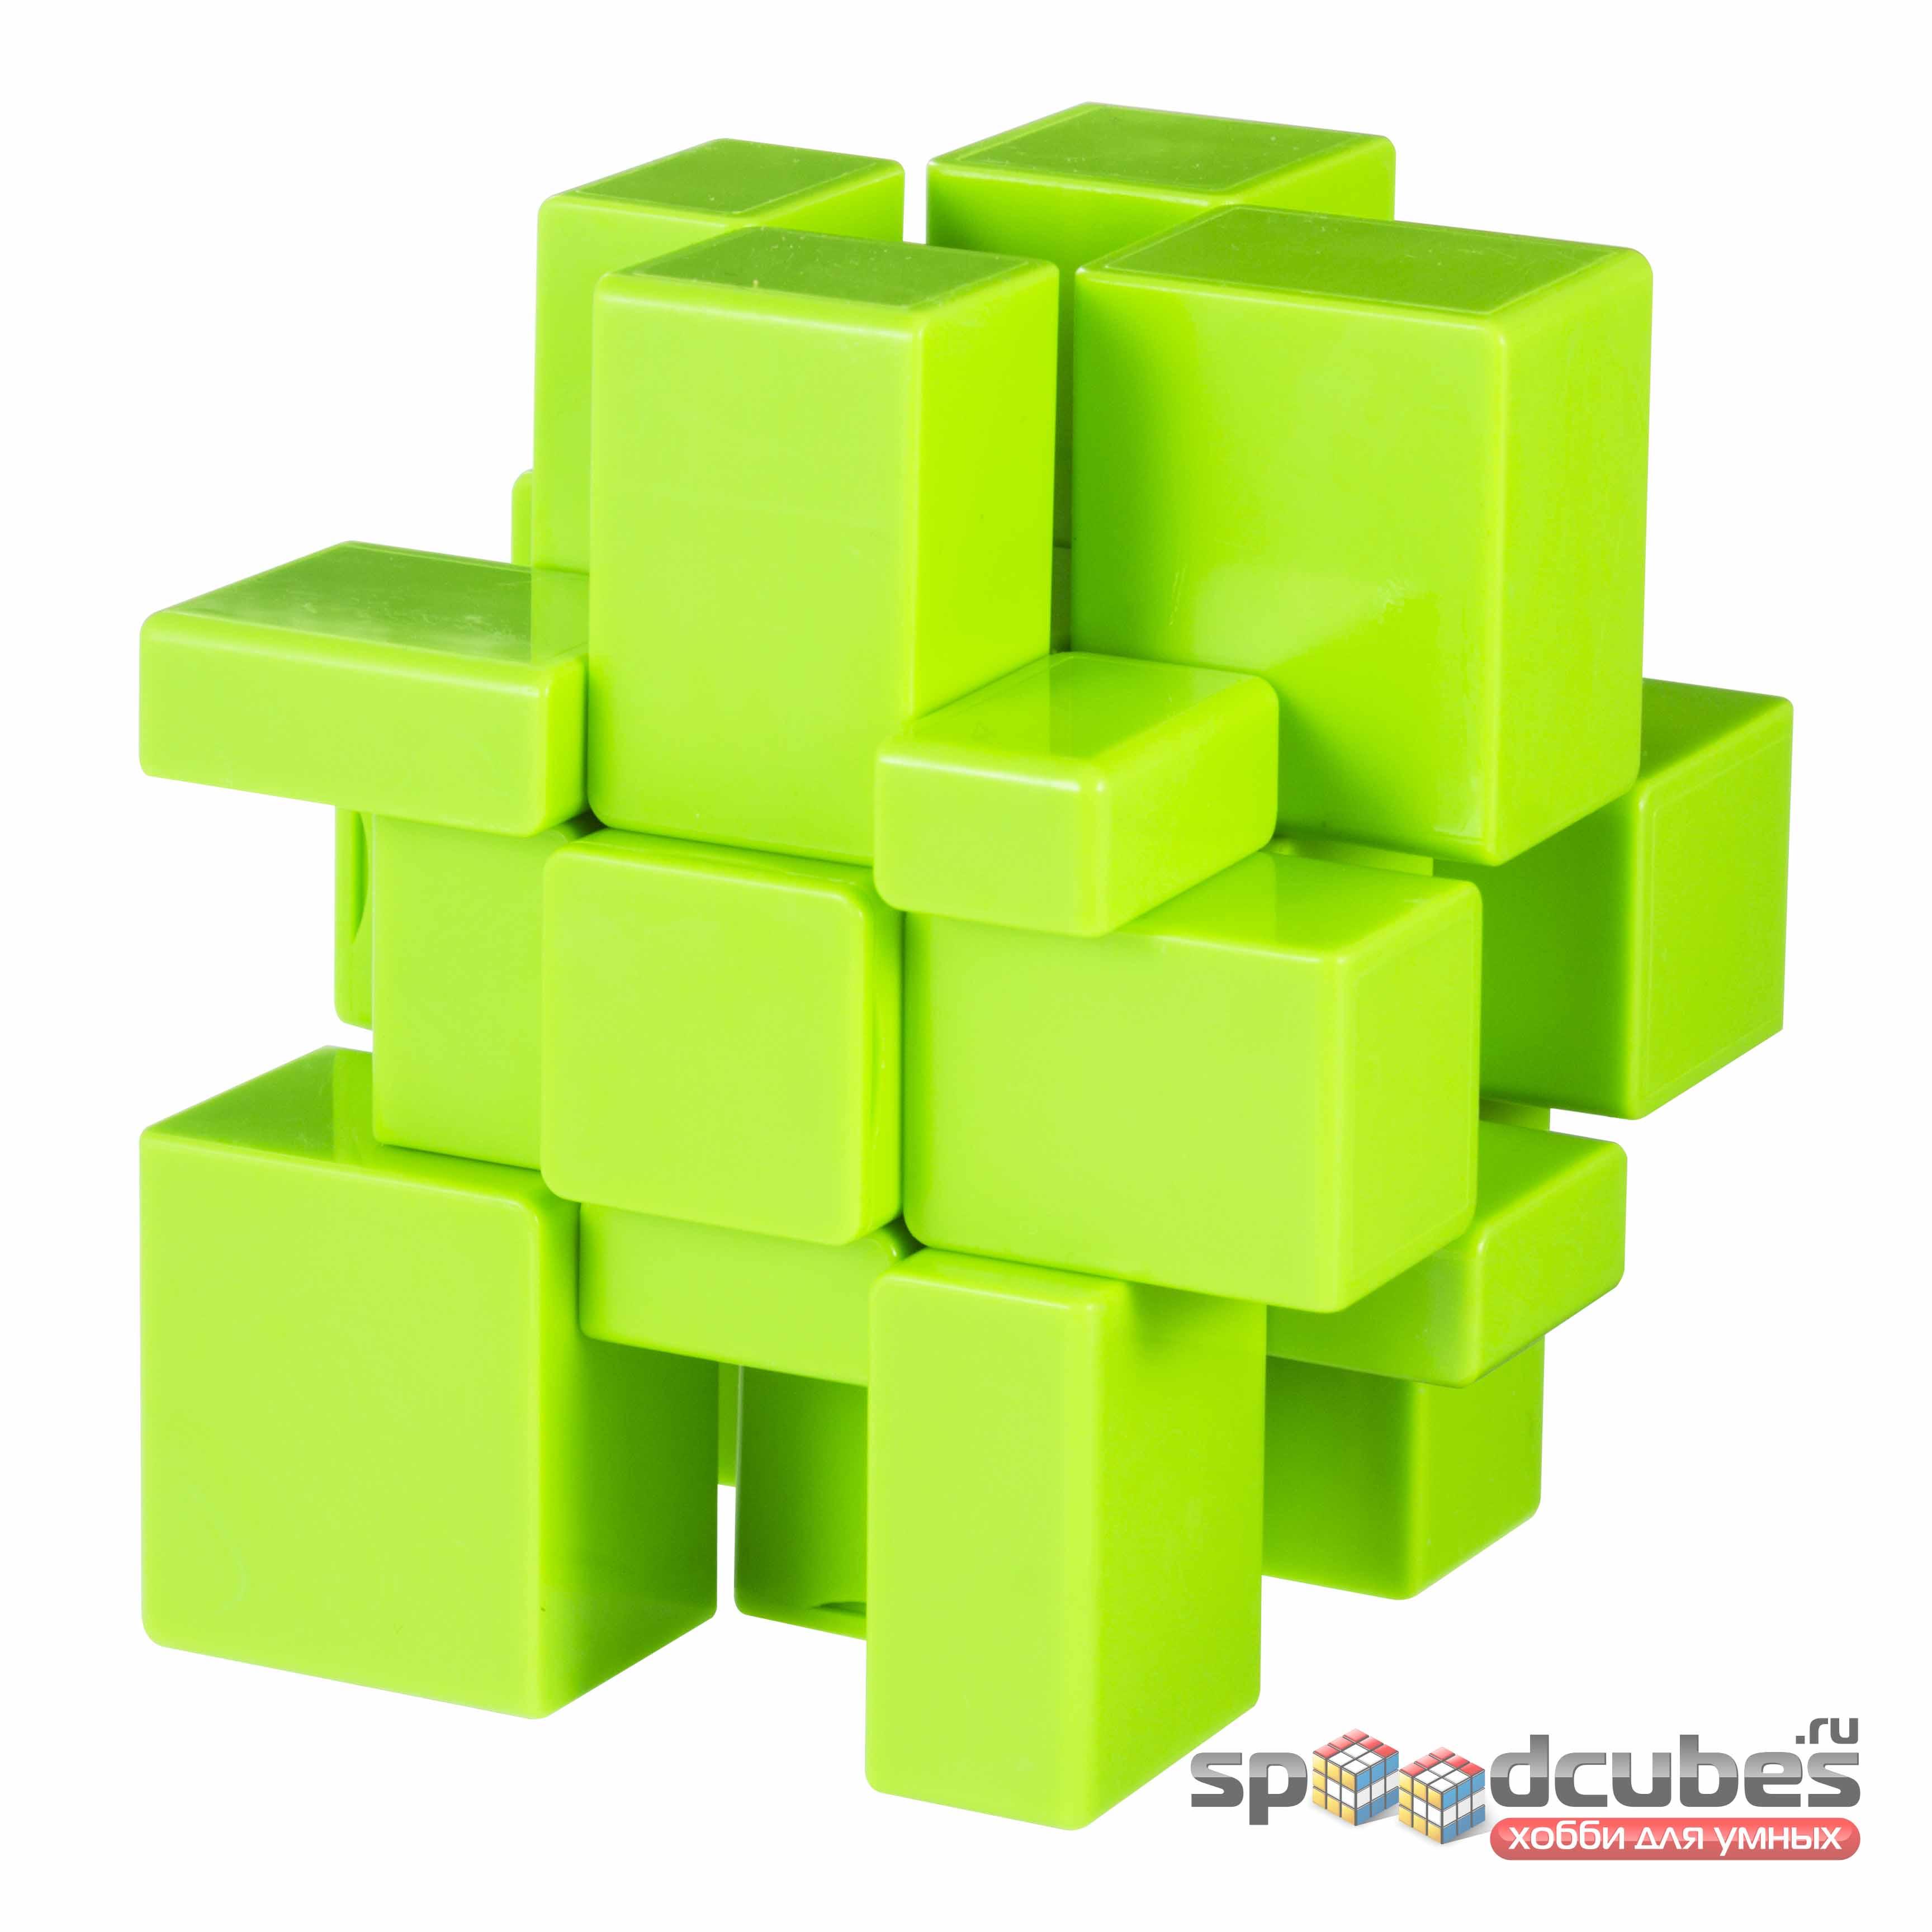 QiYi MoFangGe 3x3 Green Mirror Cube 3